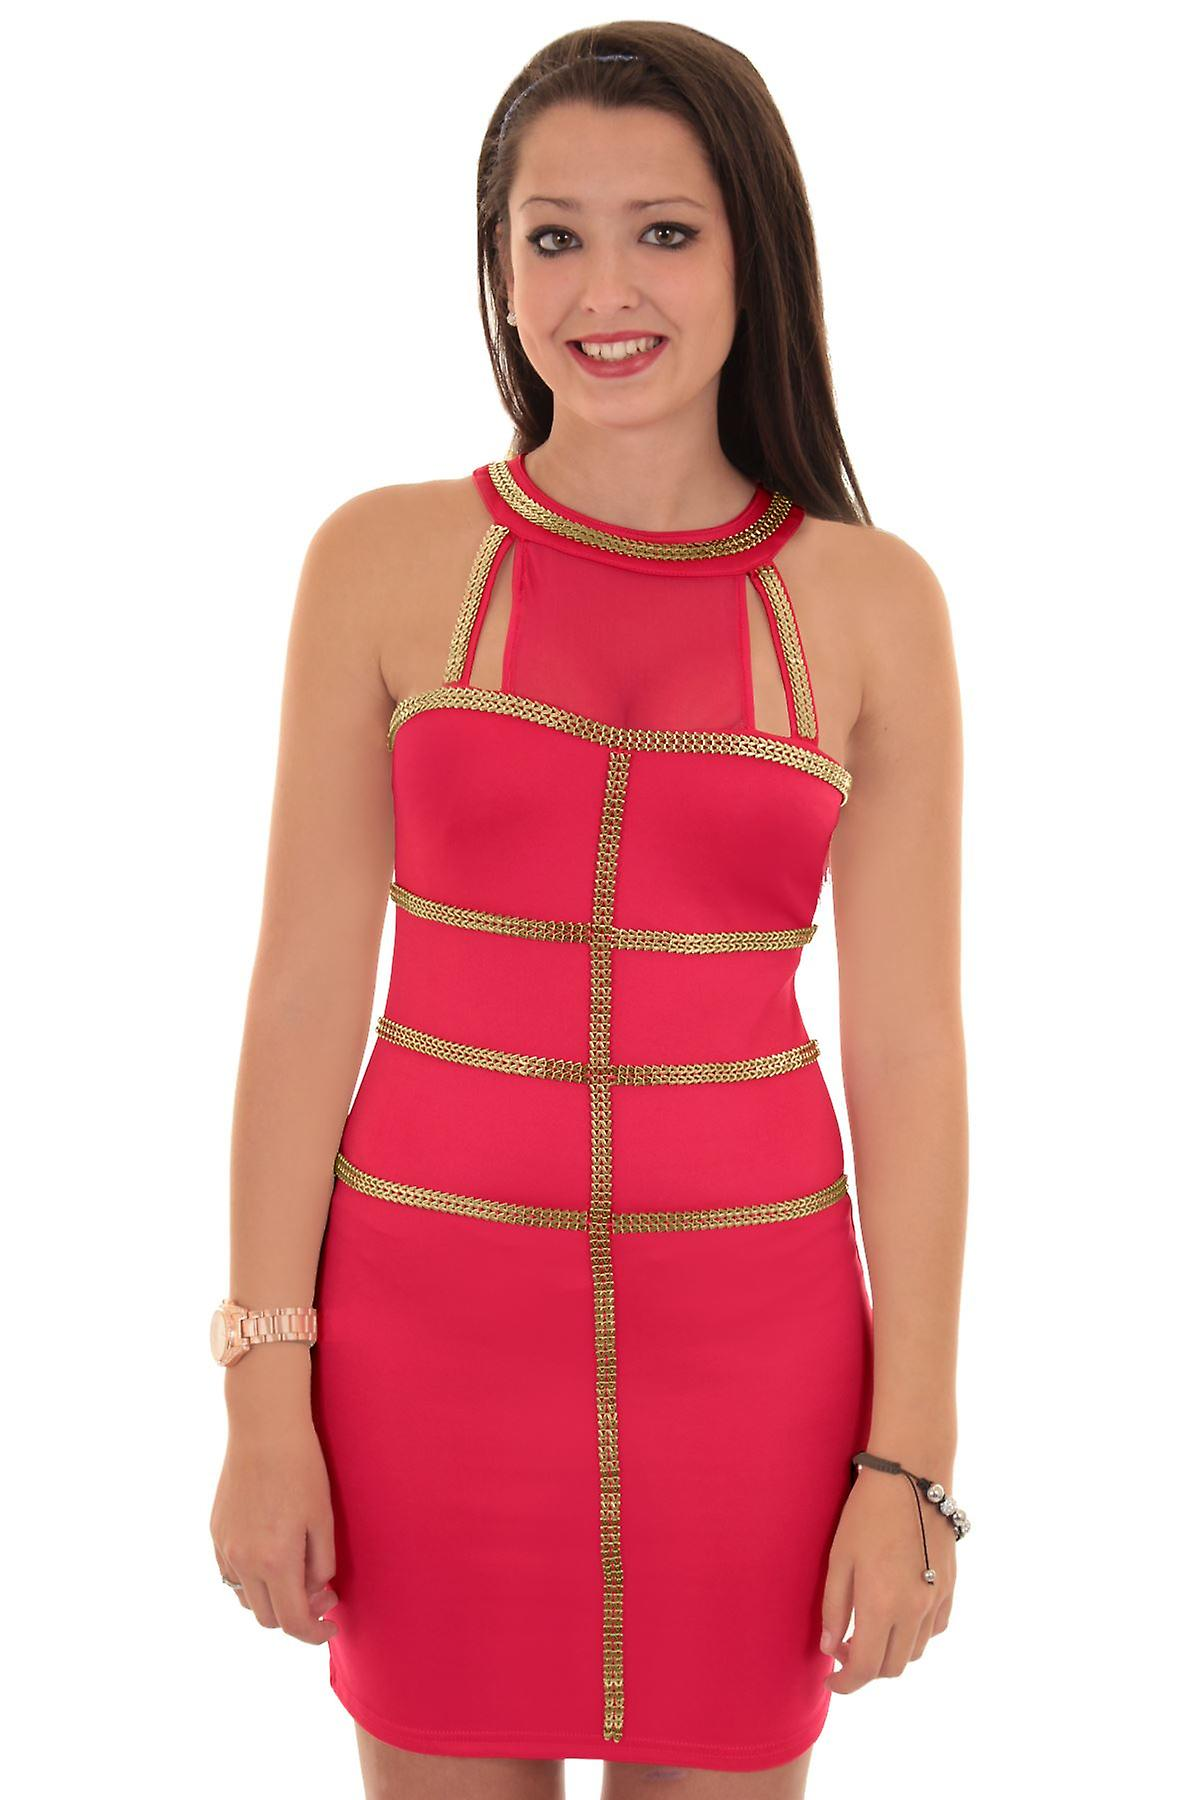 Ladies Sleeveless Mesh Insert Gold Panel Contrast Women's Short Bodycon Dress